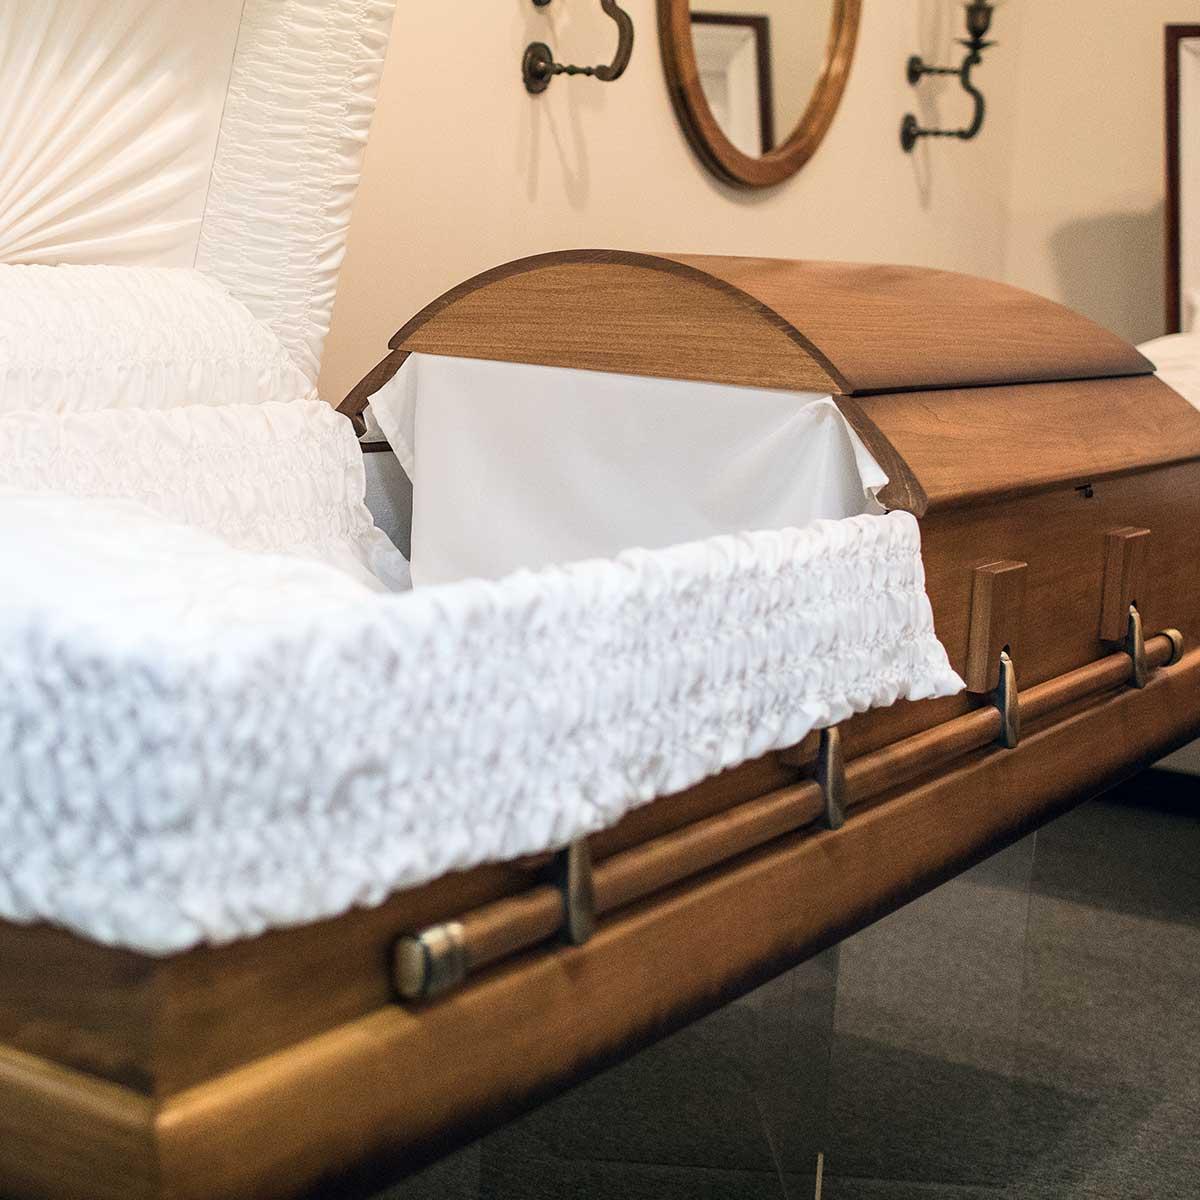 Wooden casket funeral services options